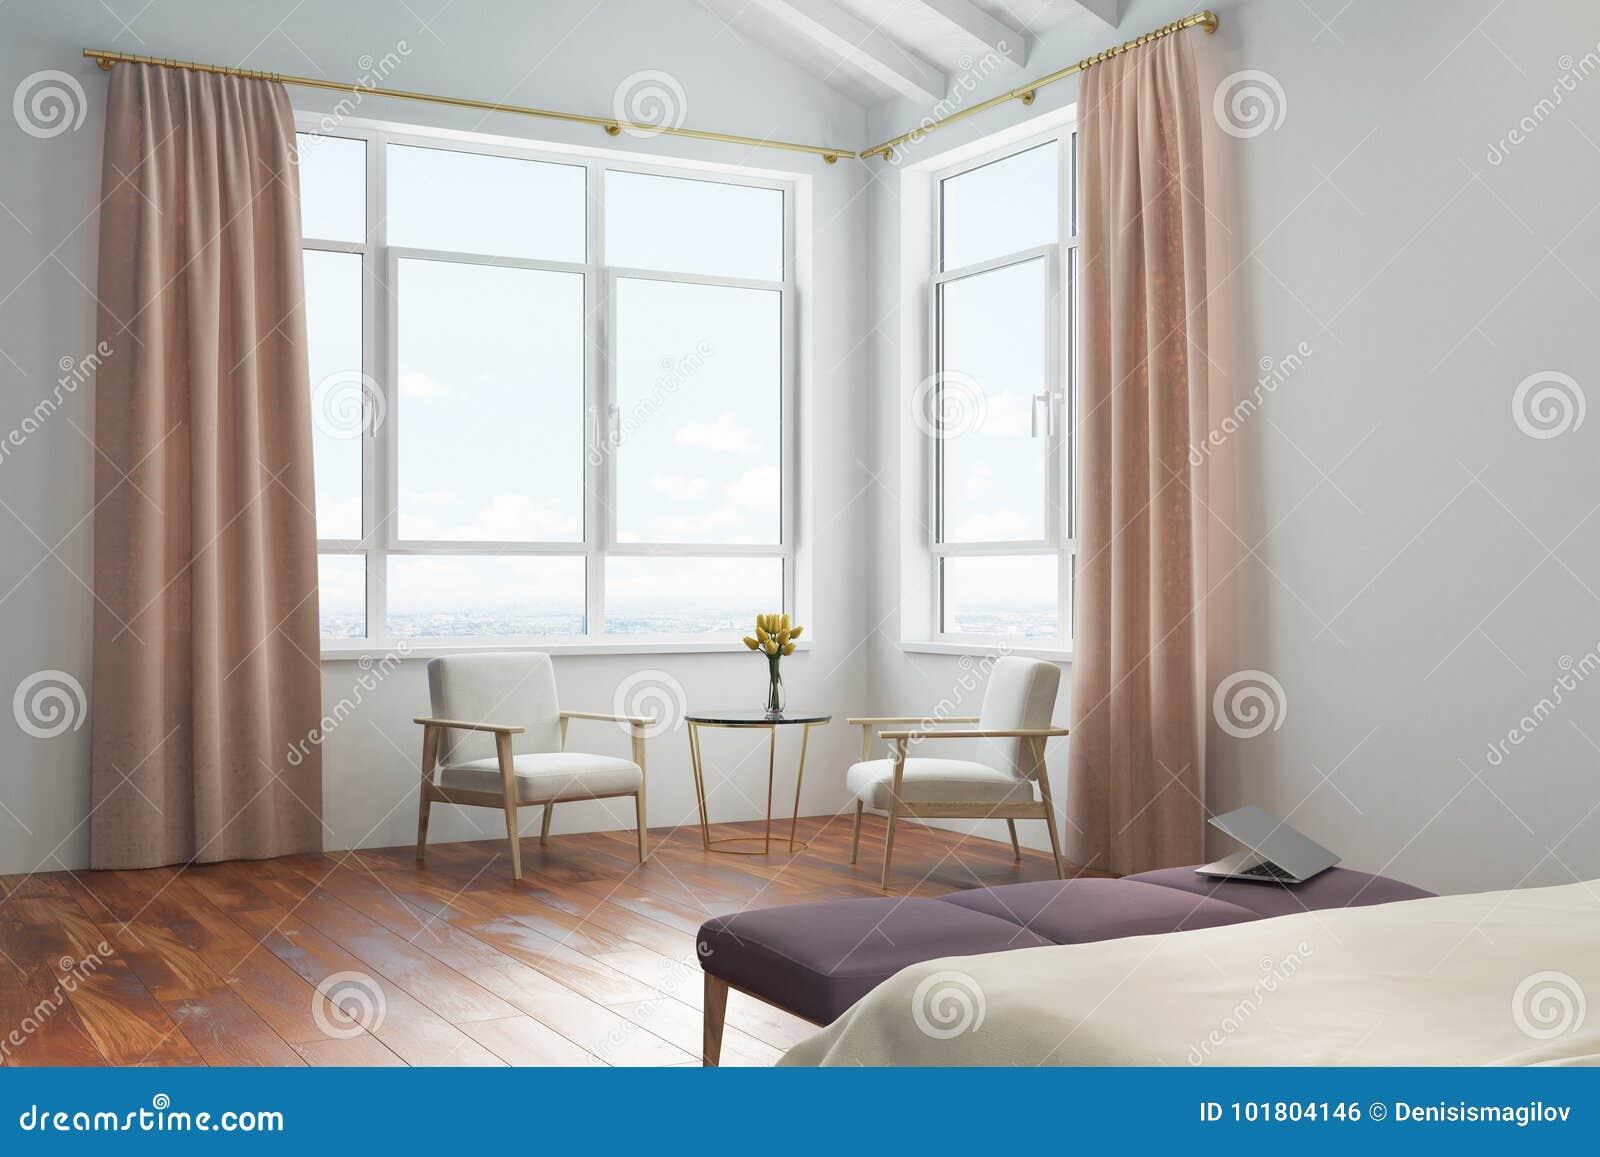 White Bedroom, Peach Curtains Stock Illustration - Illustration of ...